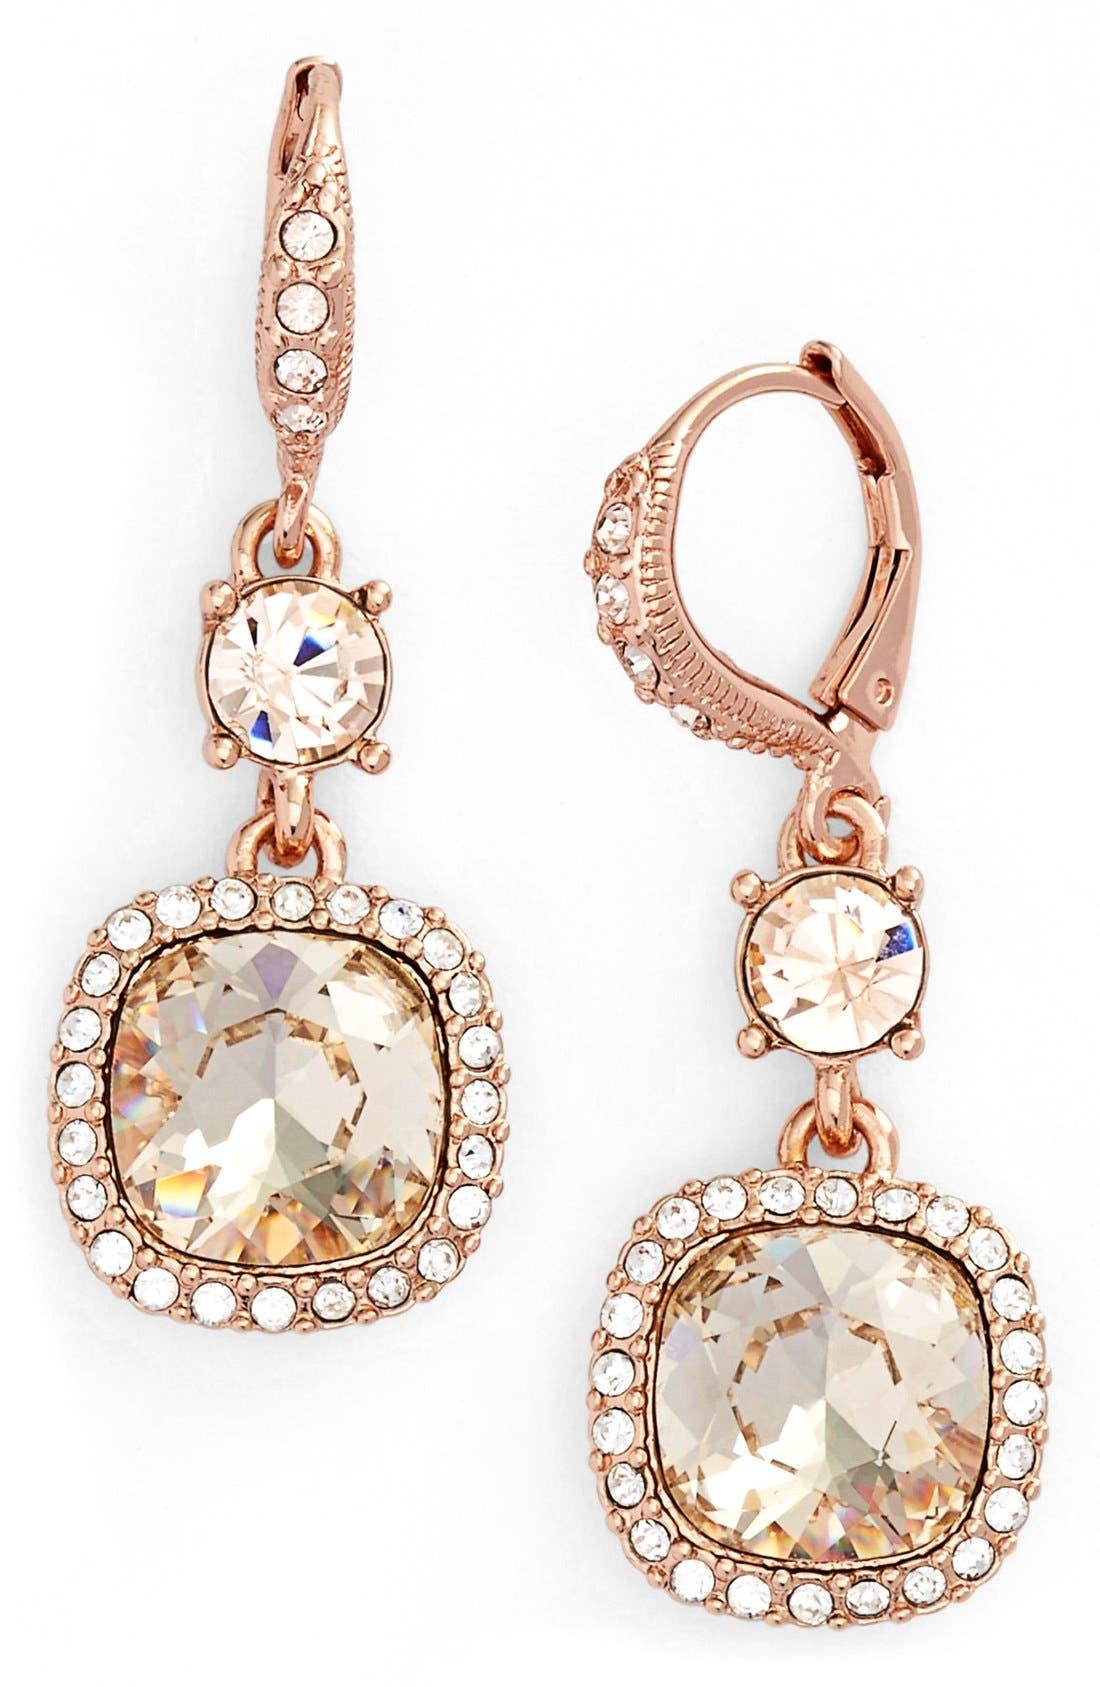 'Legacy' Drop Earrings,                         Main,                         color, Rose Gold/ Silk/ Crystal